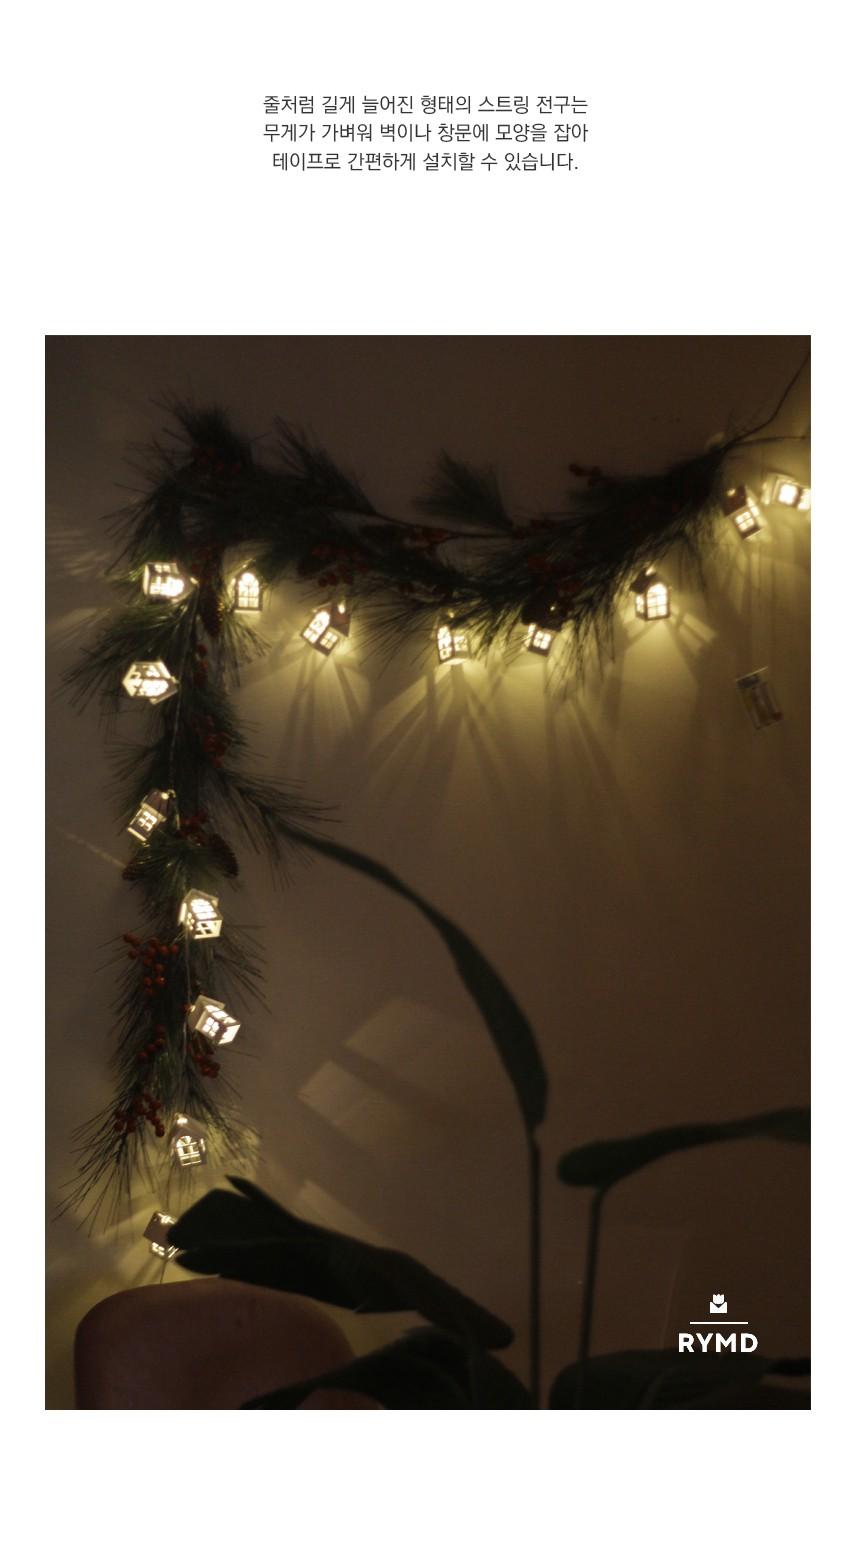 CHRISTMAS_NORDIC_COZY_HOUSE_STRING_LIGHT_03.jpg